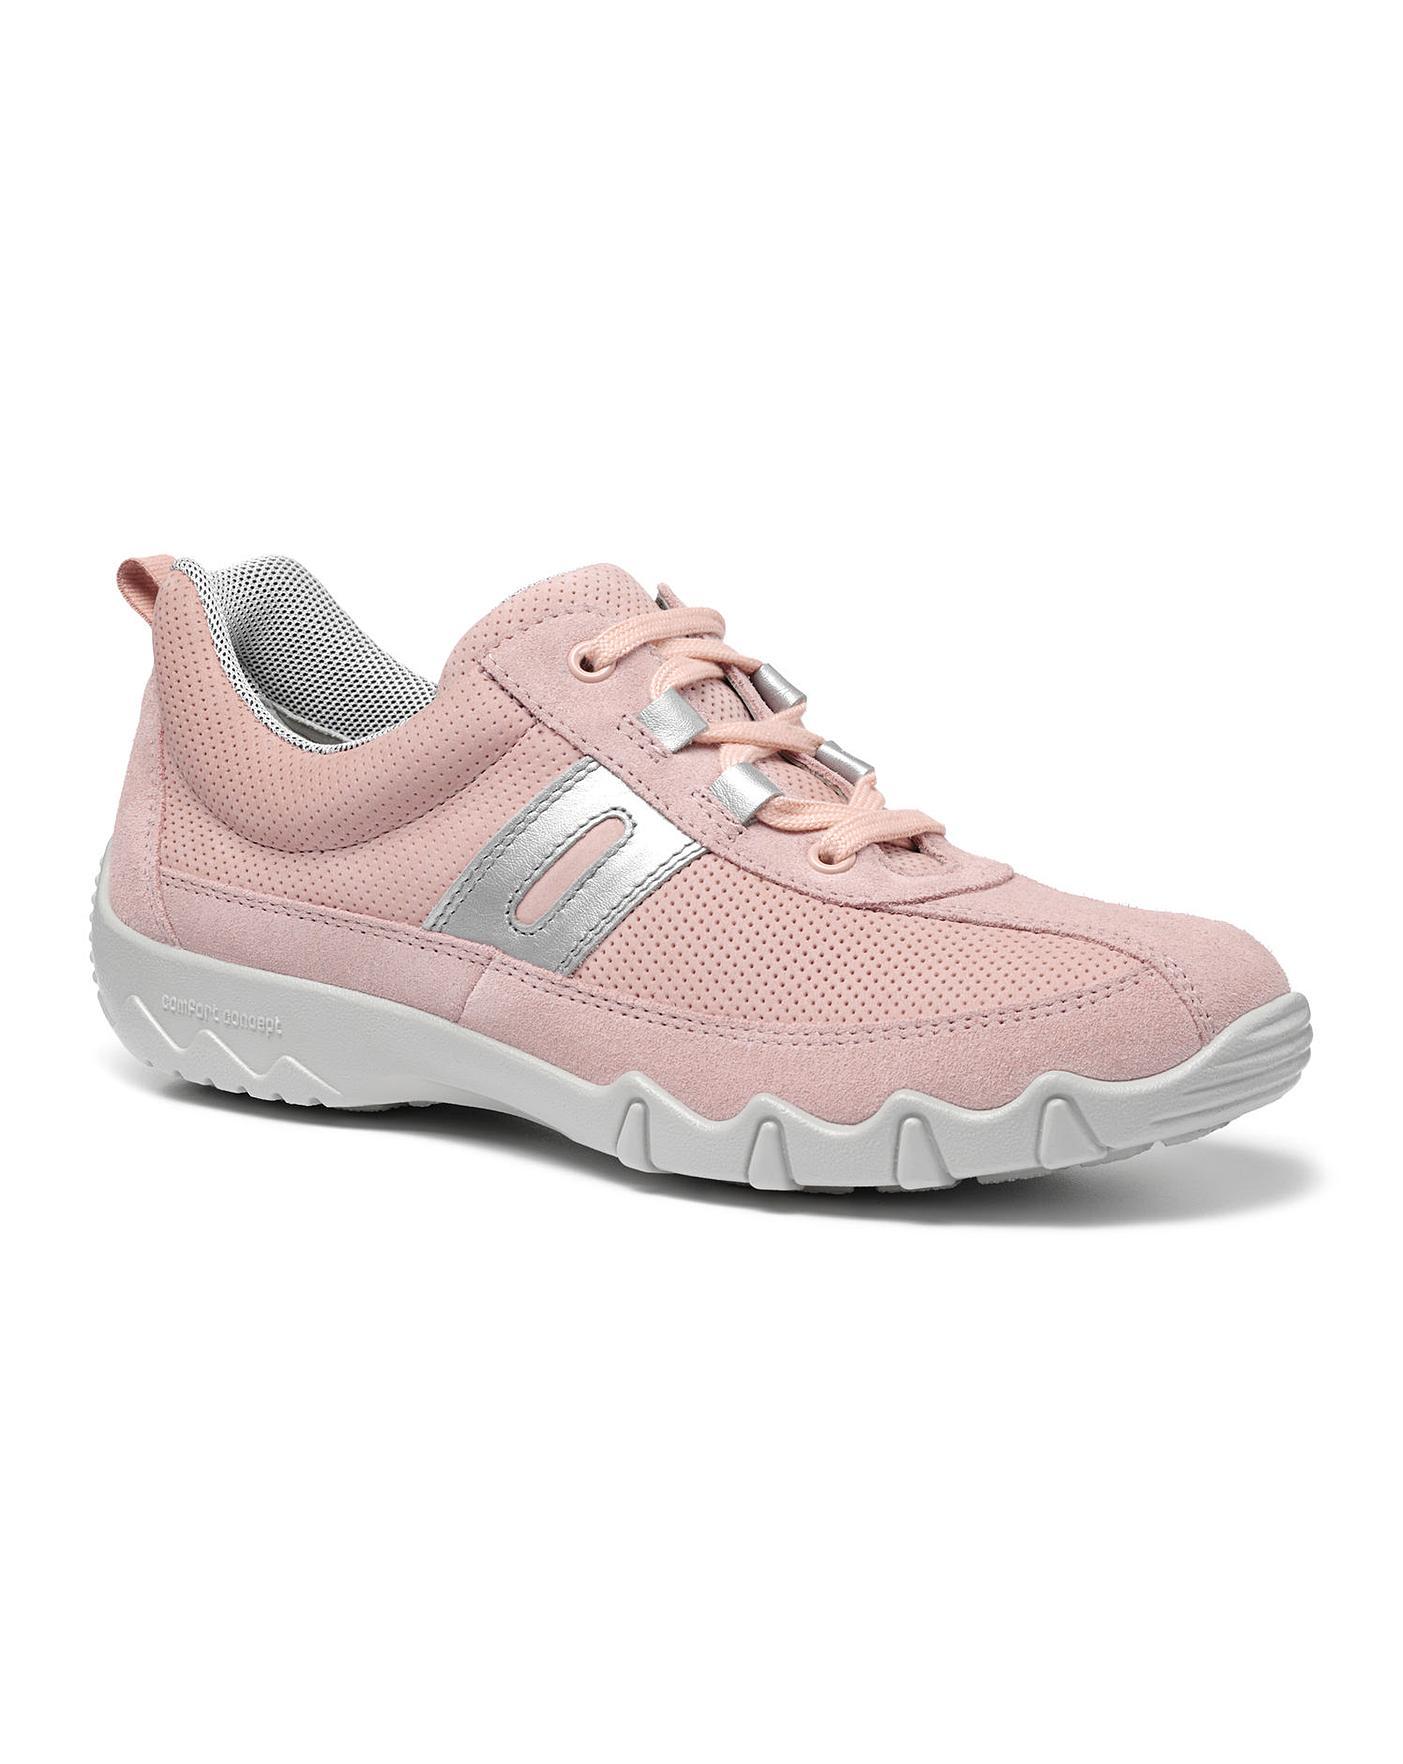 Hotter Leanne Standard Fit Lace Up Shoe